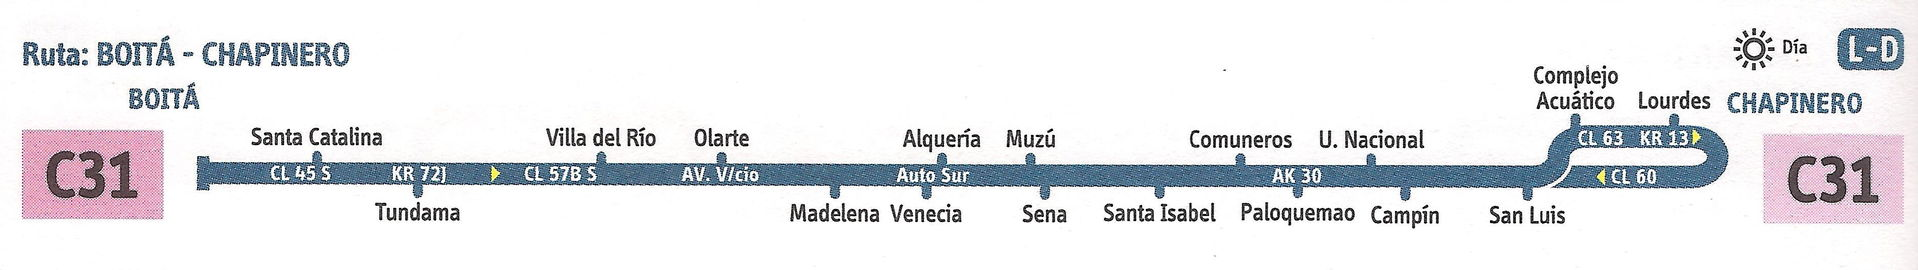 Ruta SITP: C31 Chapinero ↔ Boitá [Urbana] 1